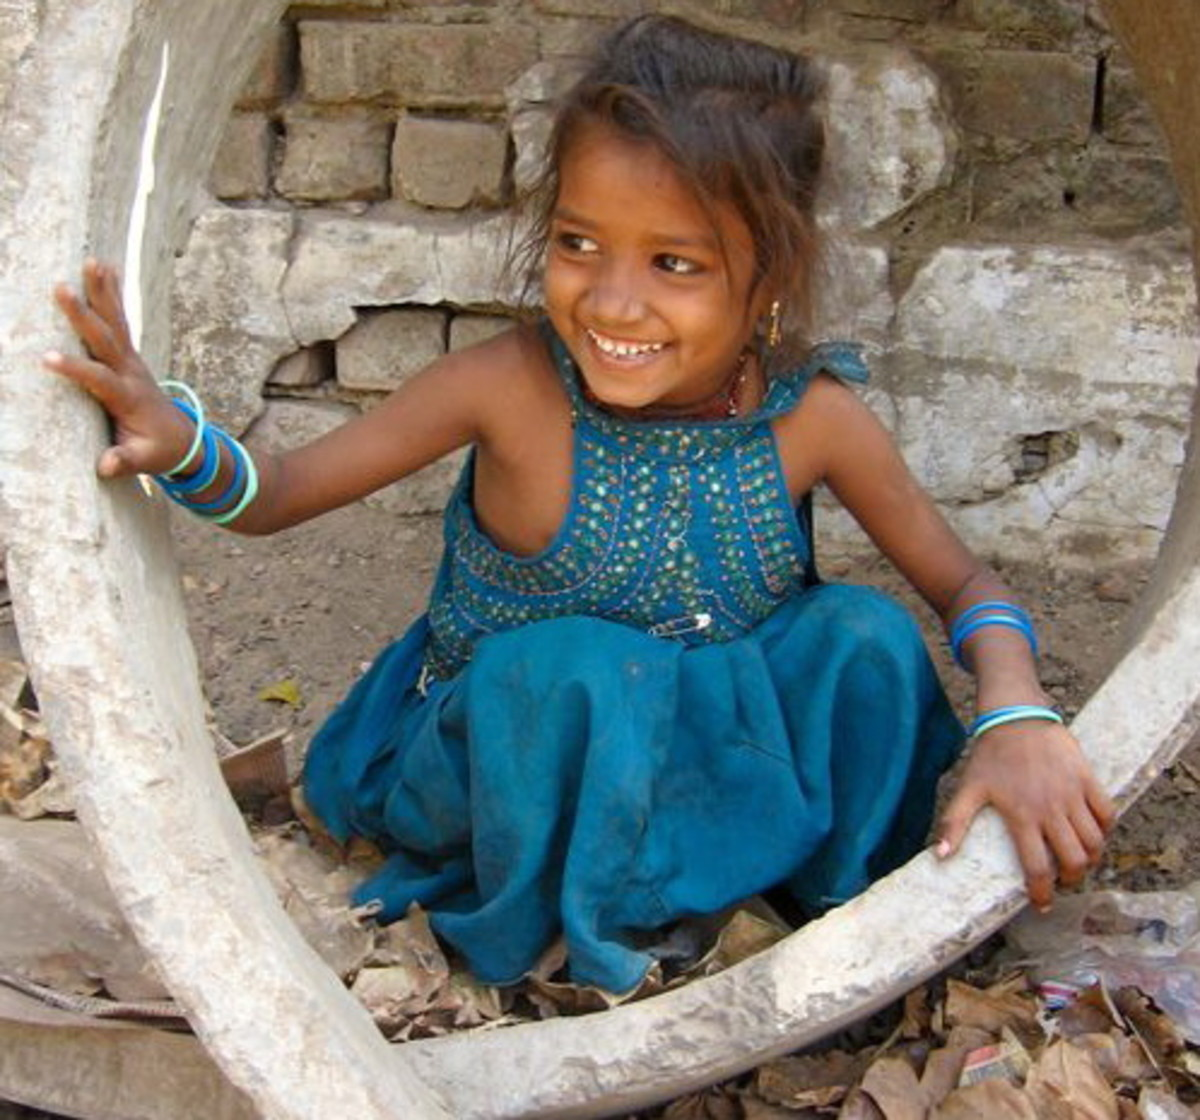 children-of-the-indian-slums